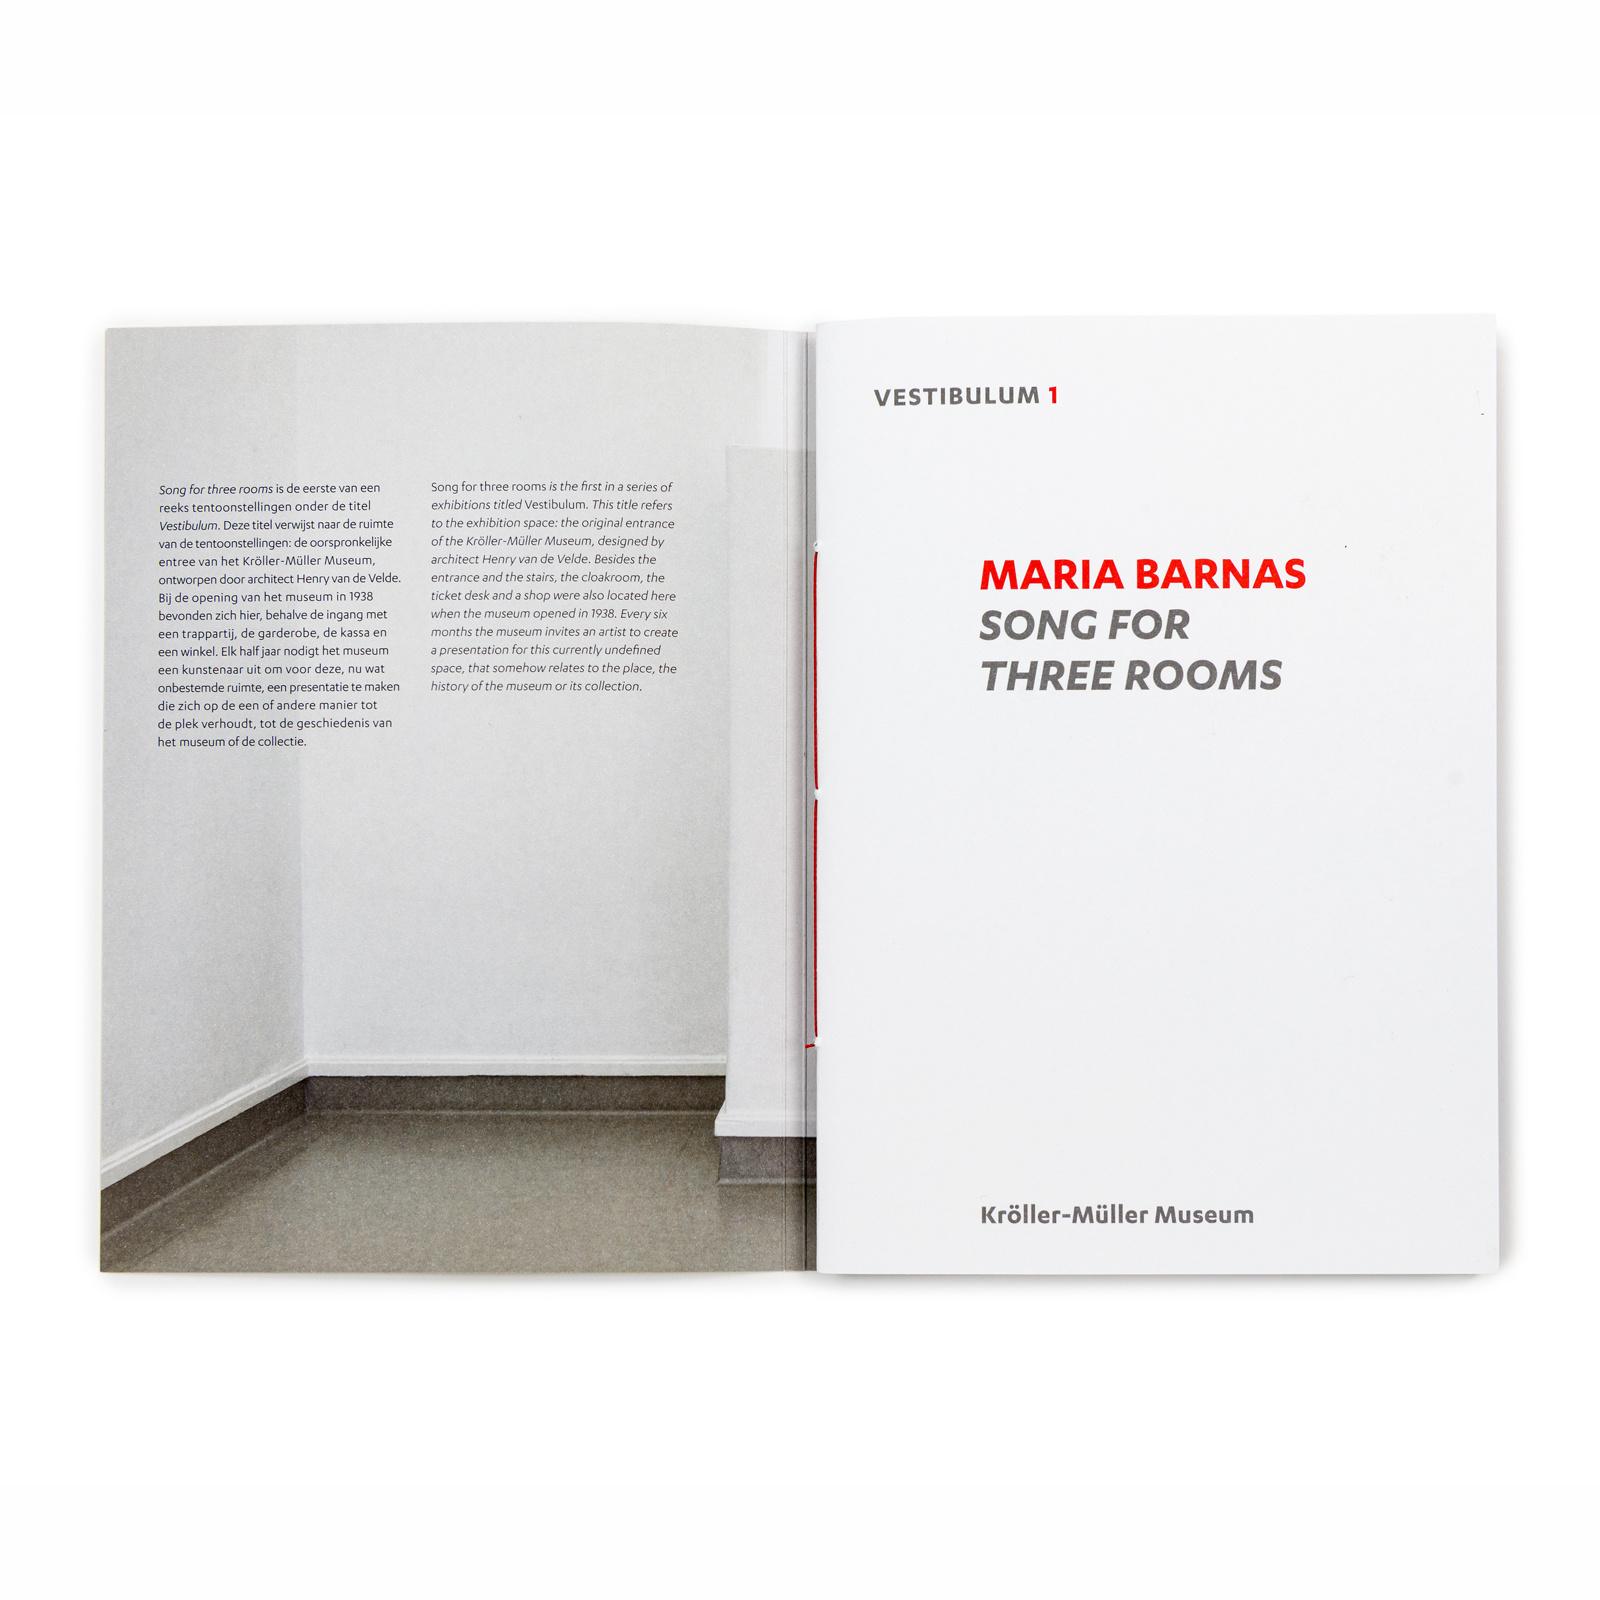 Vestibulum 1 Maria Barnas Song for three rooms